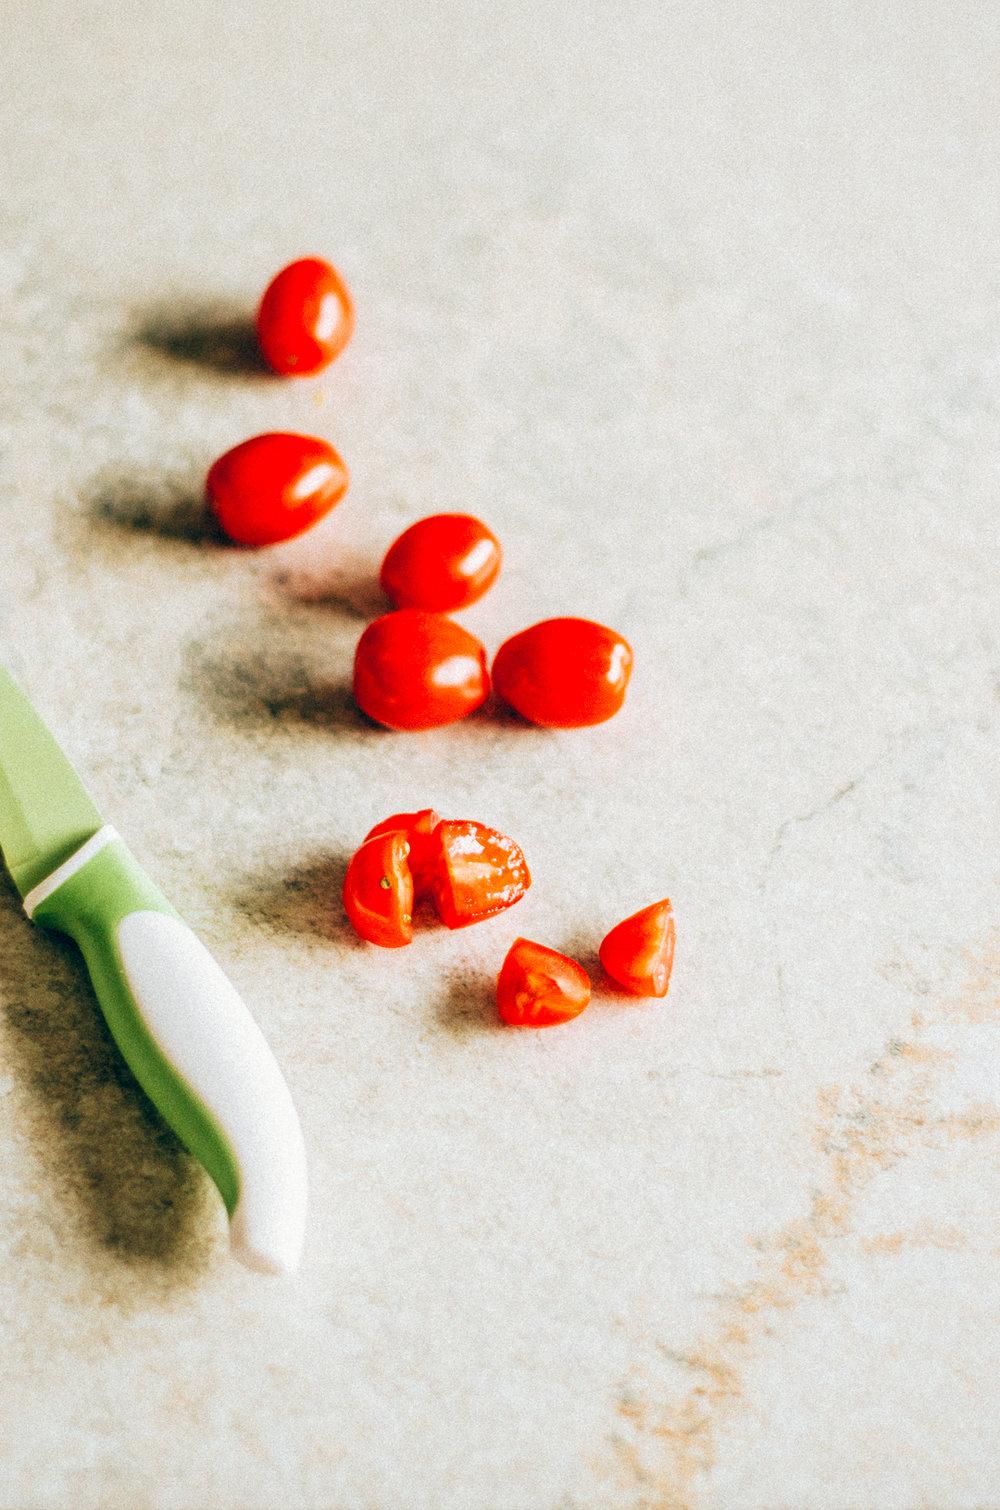 Aglio olio a simple italian pasta recipe that I've upgraded to include veggies & eggs! It's simply divine! thenomadicwife.com